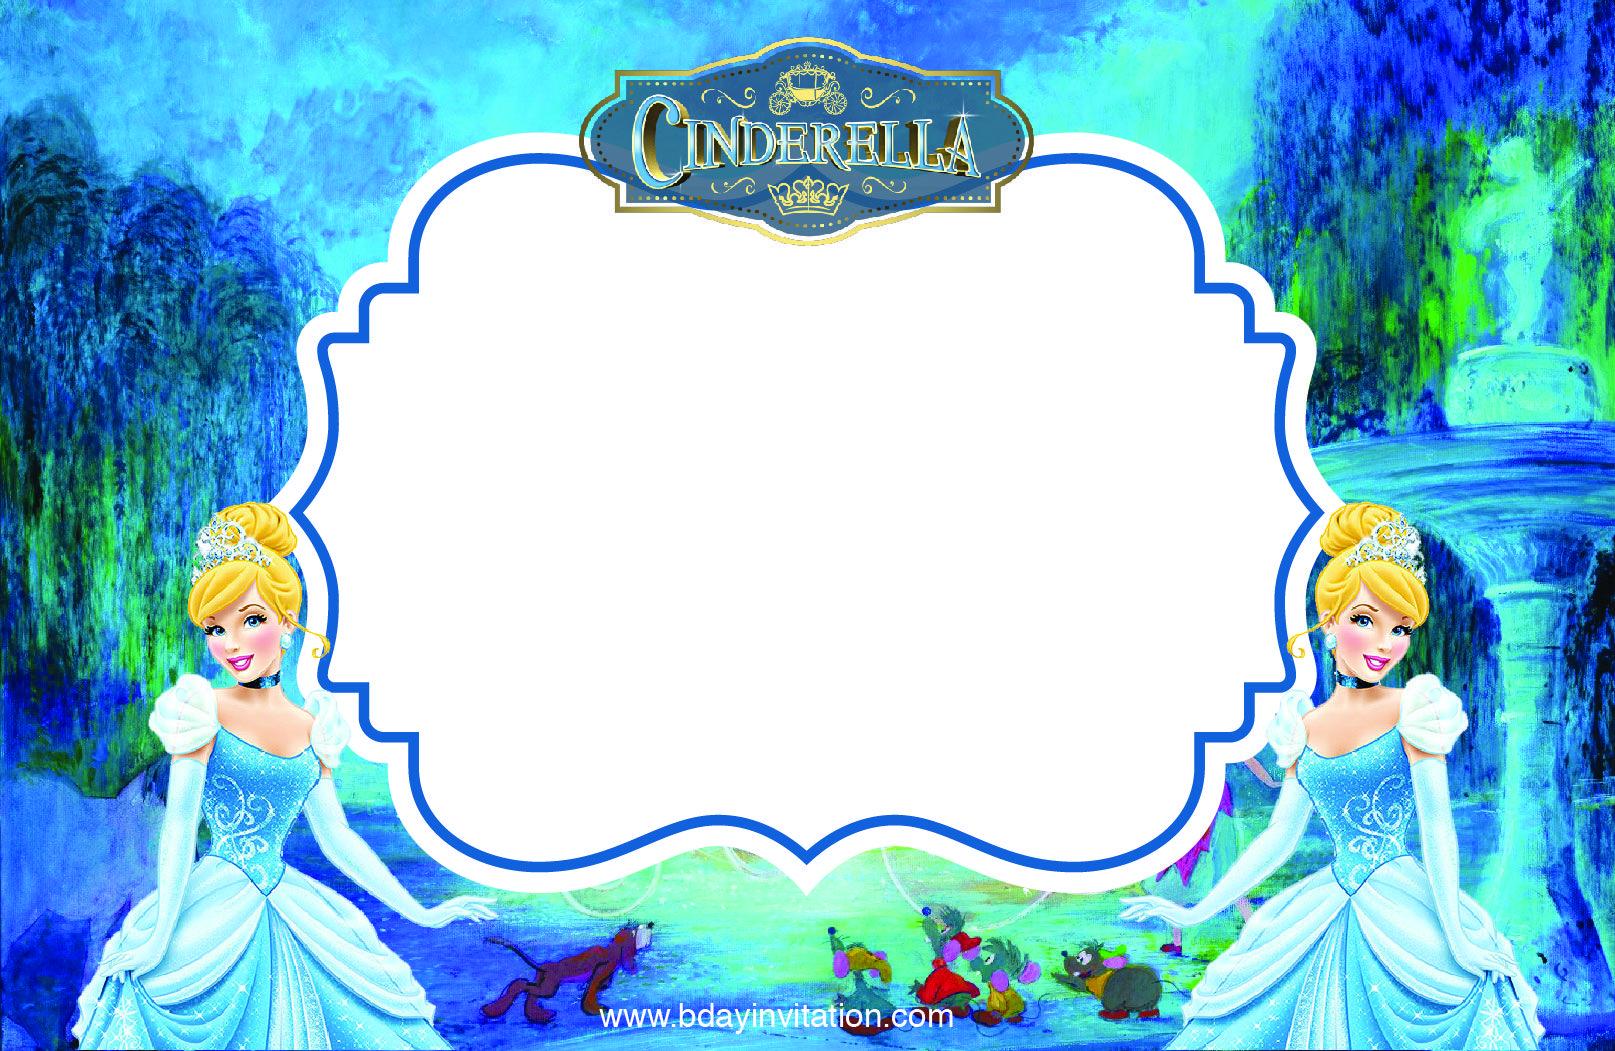 Download FREE Printable Disney Cinderella Party Invitation Template